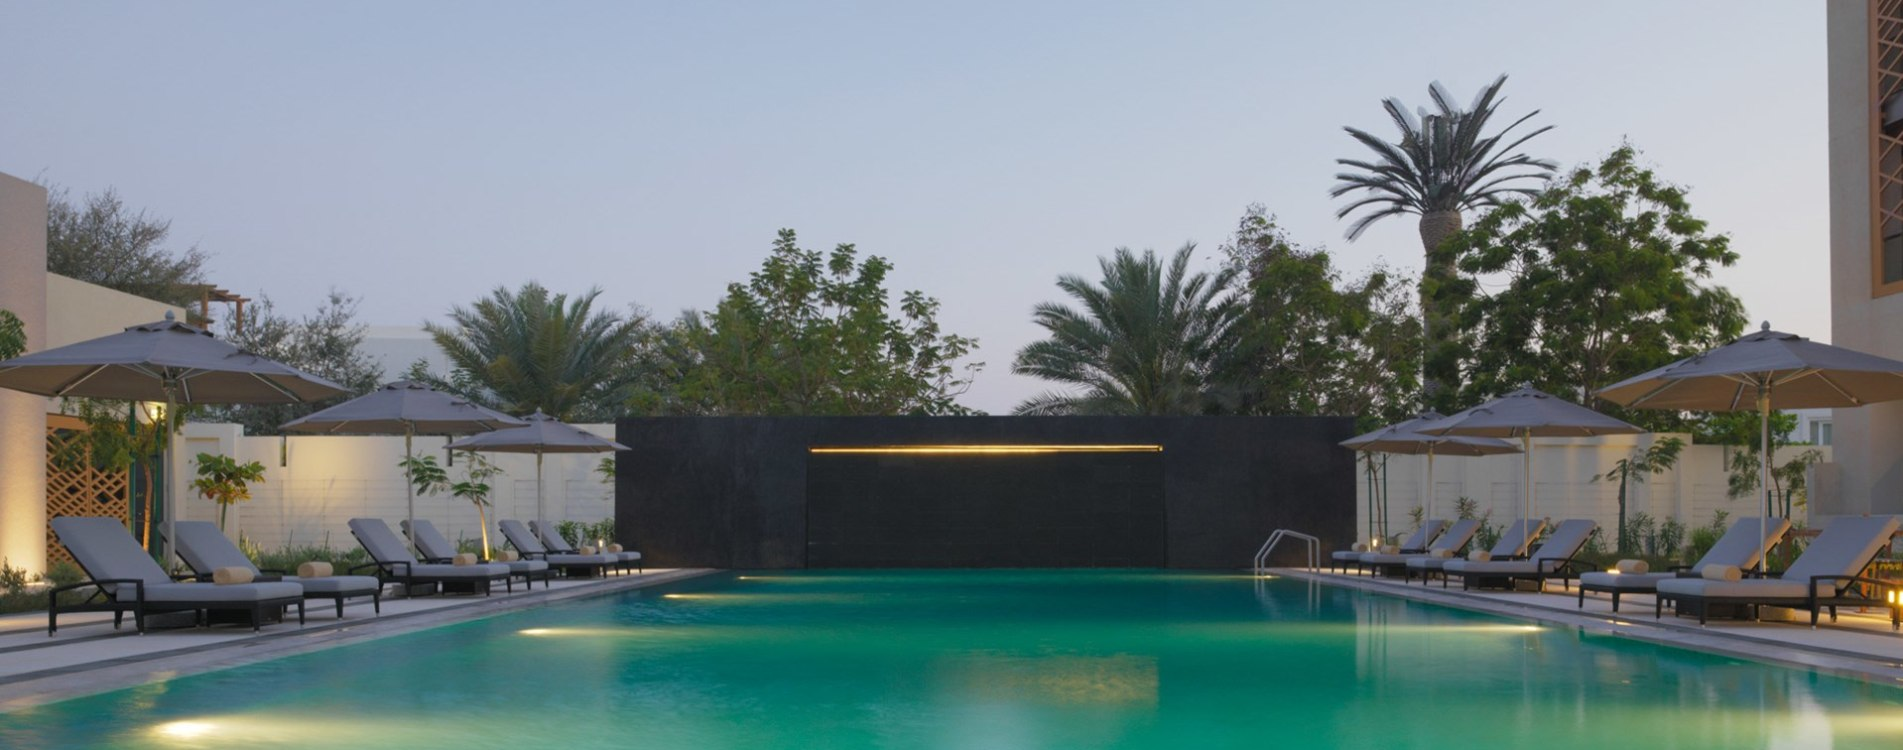 Kempinski-Hotel-Muscat-Exterior-Hauptpool-Oman